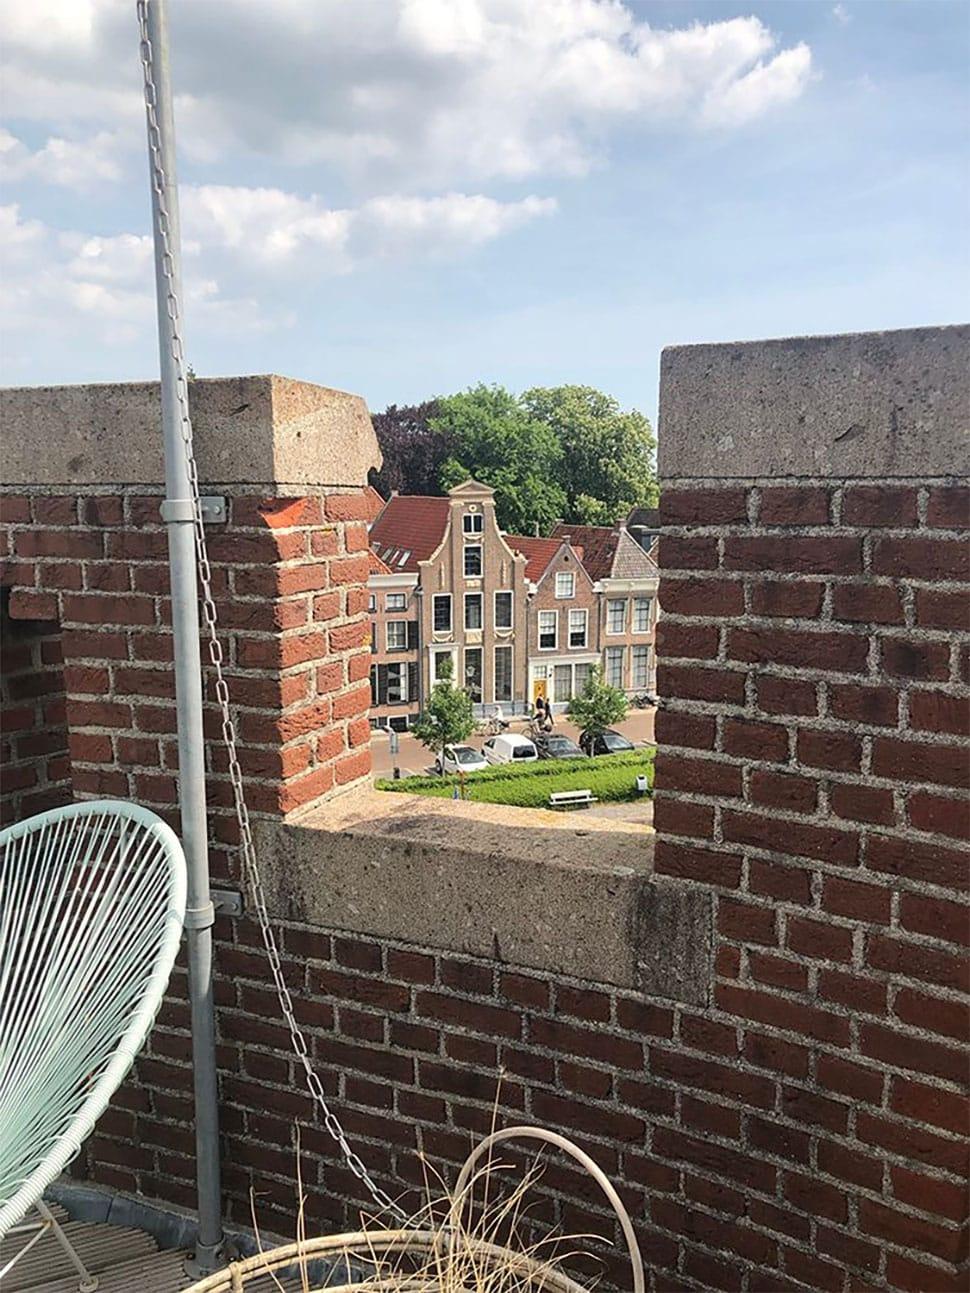 Pelsertoren Zwolle